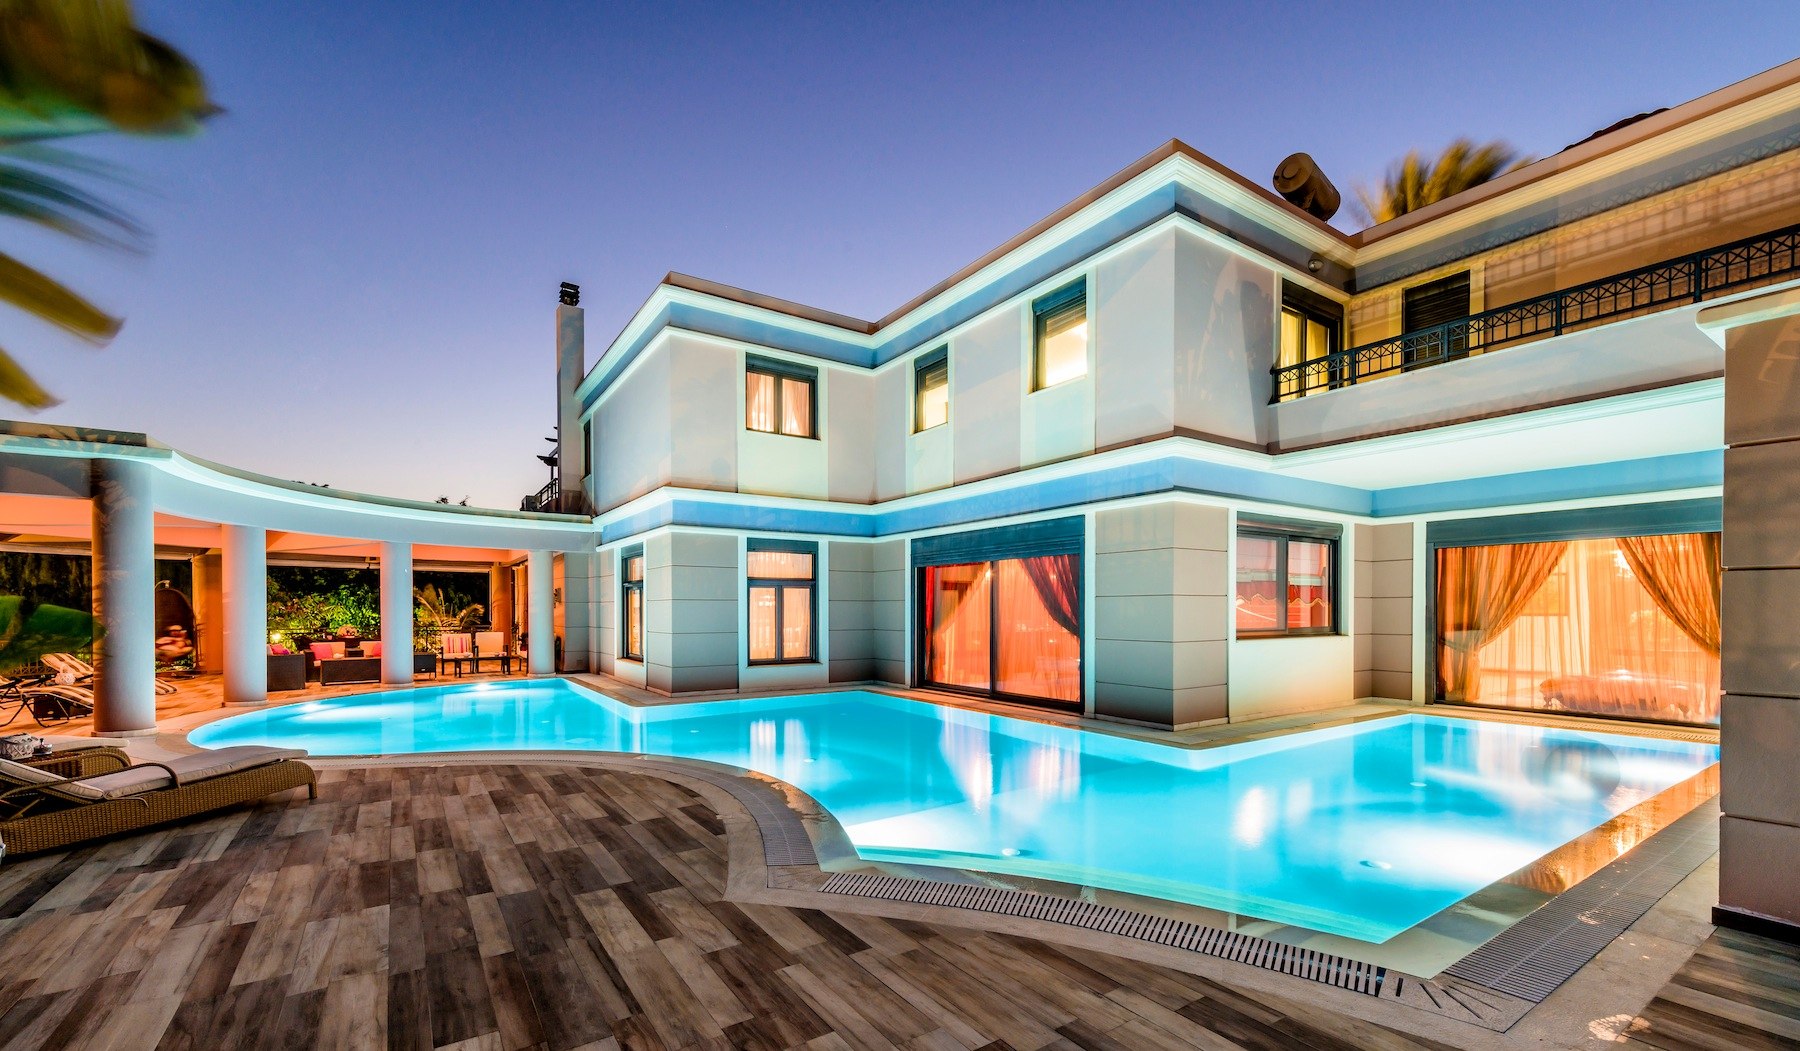 Single Family Home for Sale at Elite Elegance Galinou Elite Elegance Rhodes, Southern Aegean, 85100 Greece